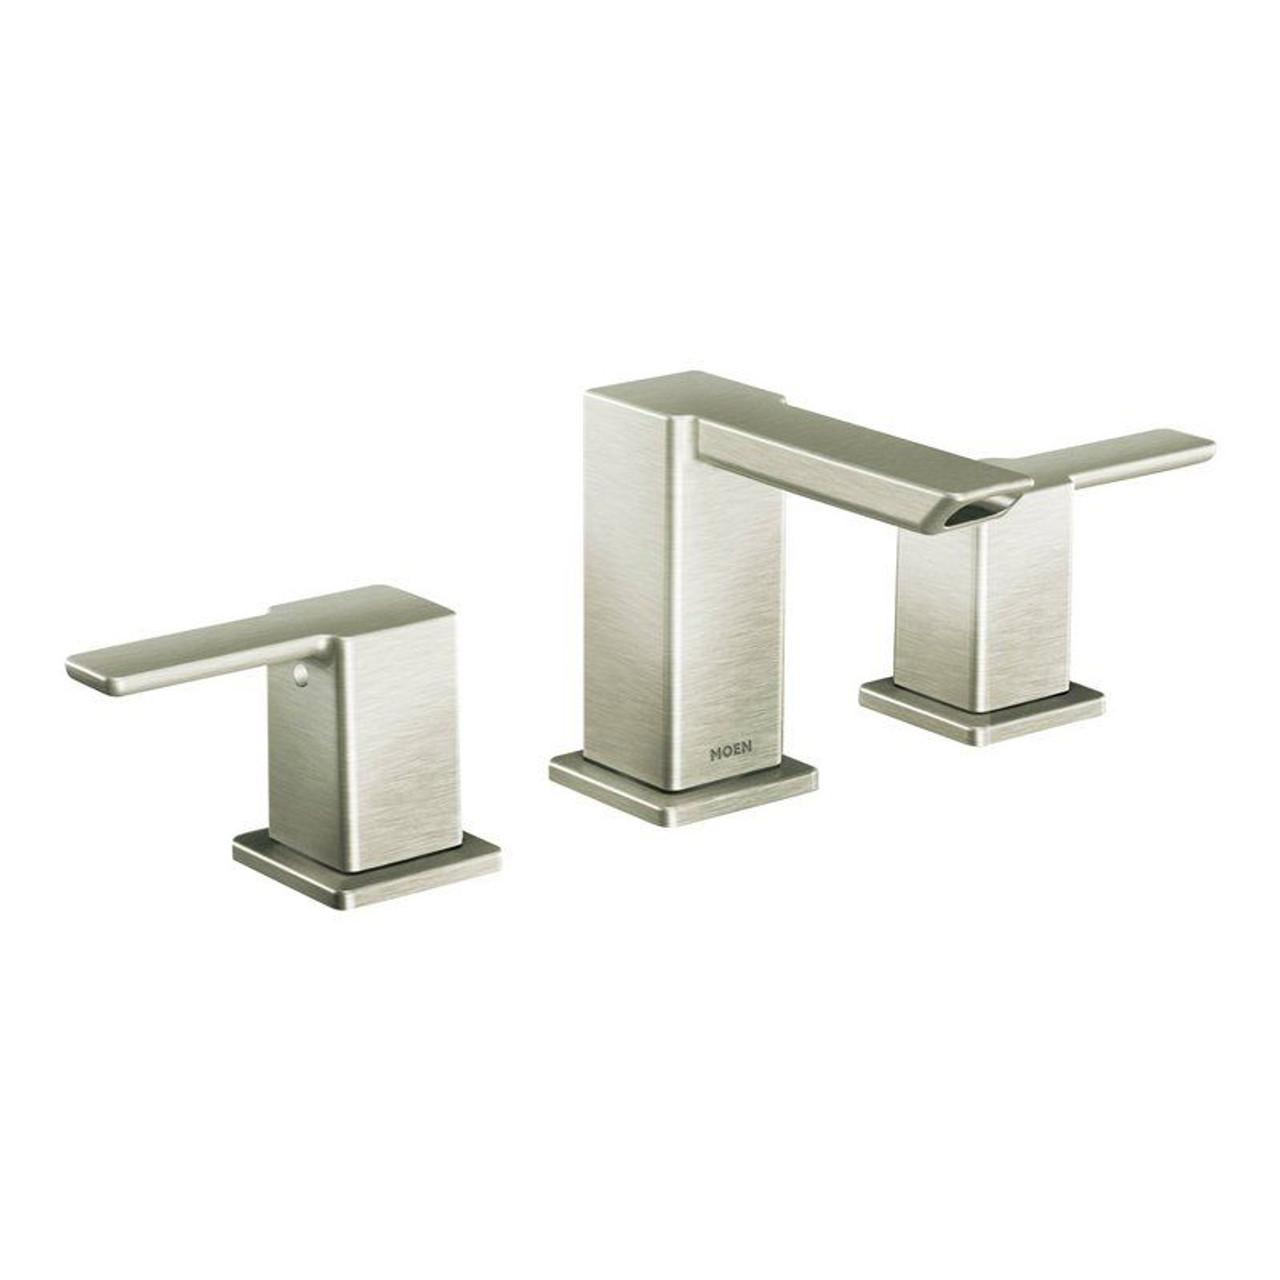 Moen TS6720BN 90 Degree Double-Handle Widespread Bathroom Faucet